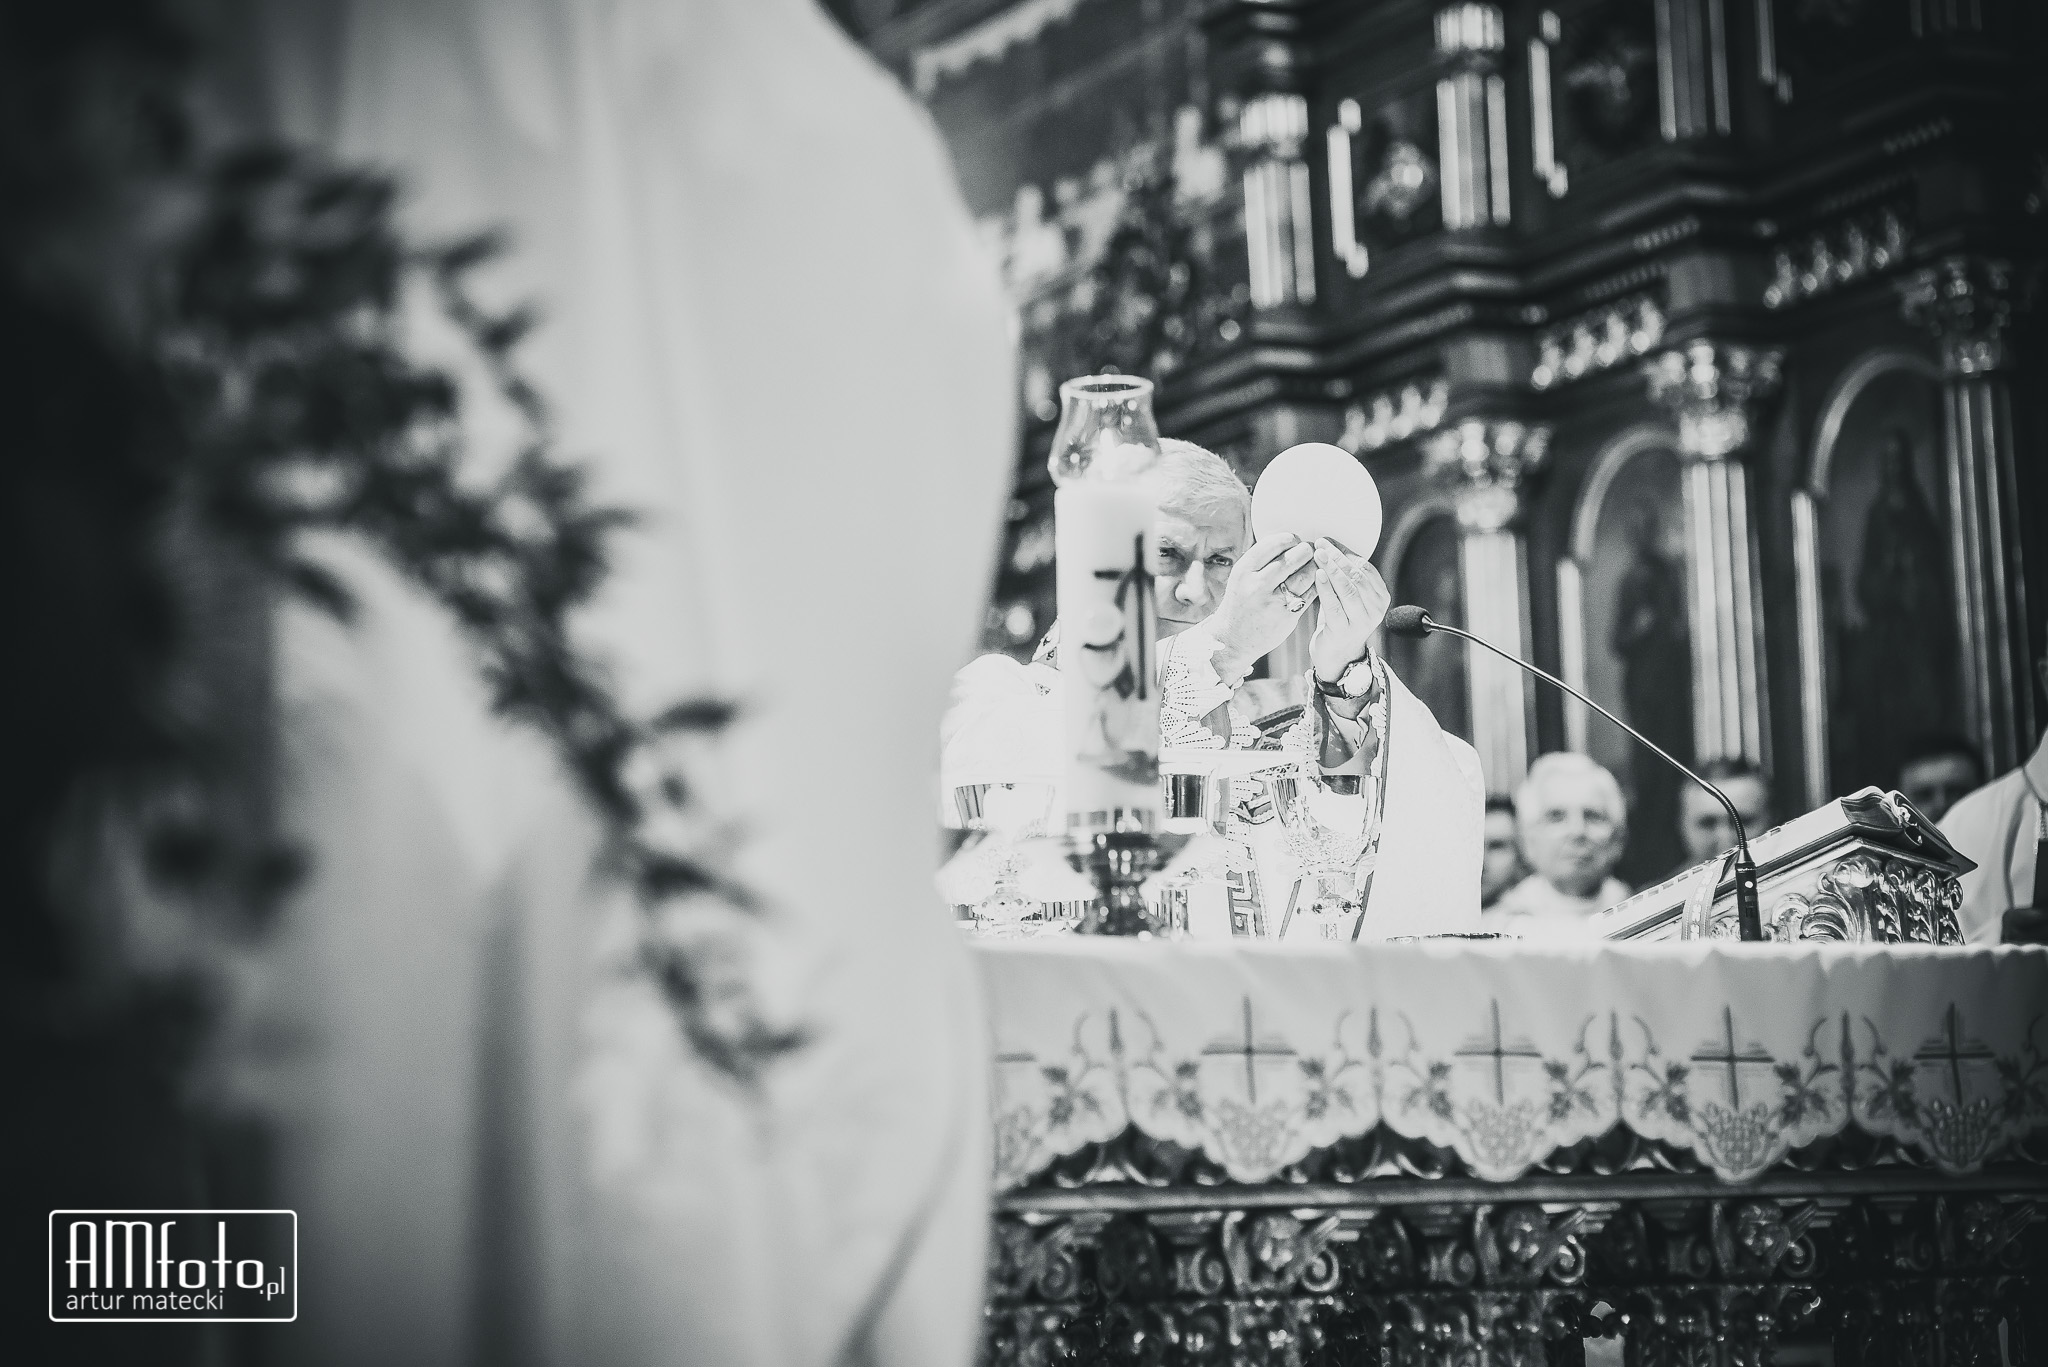 Swiecenia_Prezbiteratu_27-05-2017__Kalisz____www_amfoto_pl___0426____AMF_5551.jpg